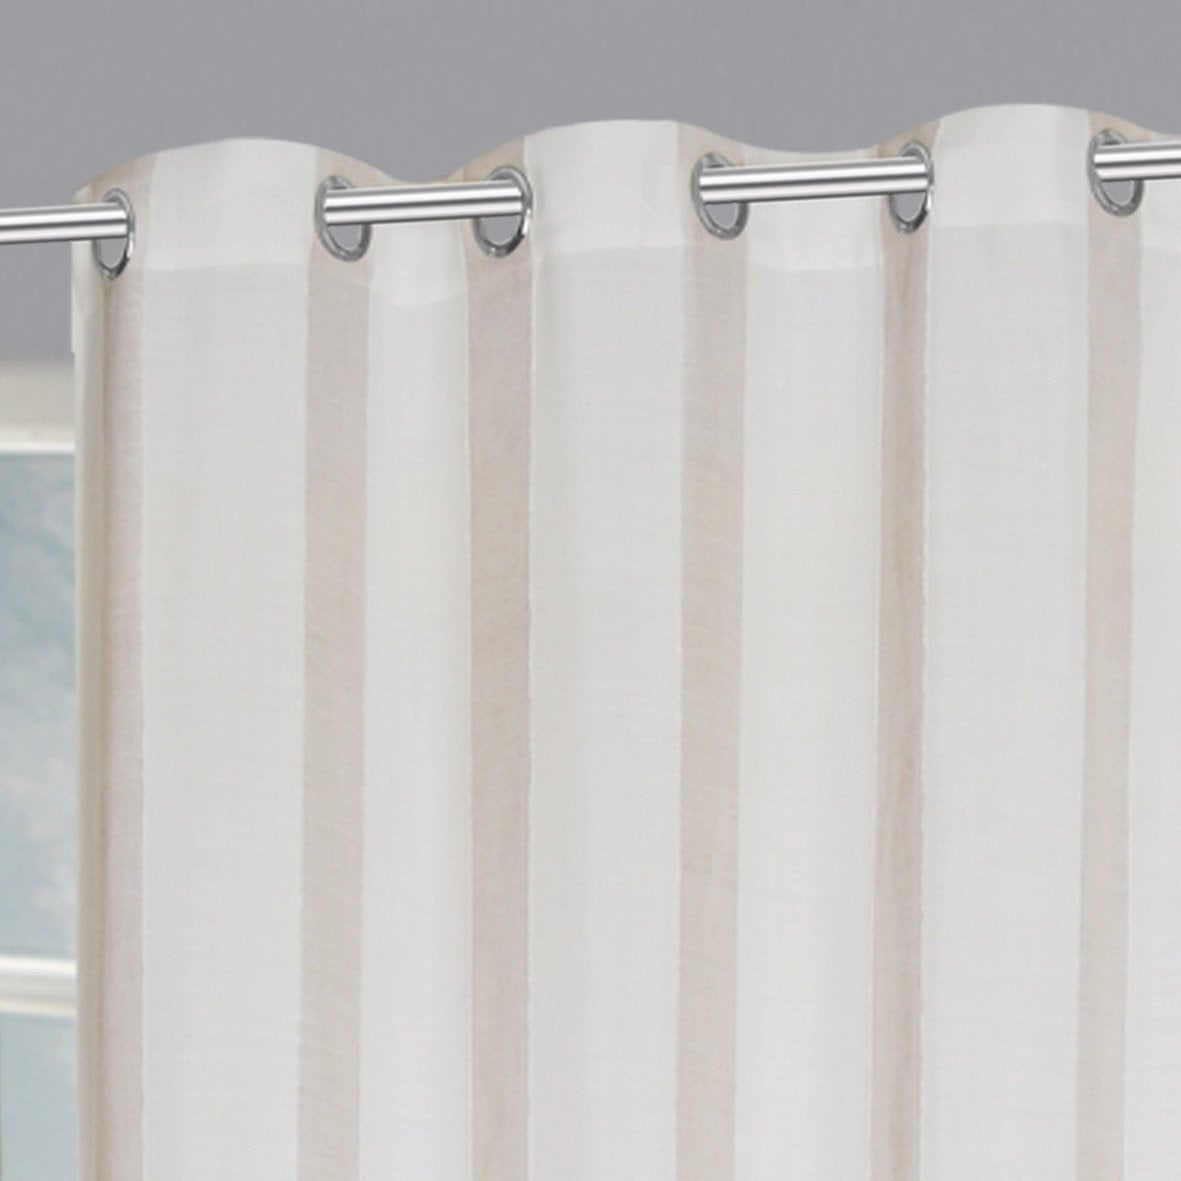 Rideau tamisant, Madina blanc et beige l.140 x H.260 cm